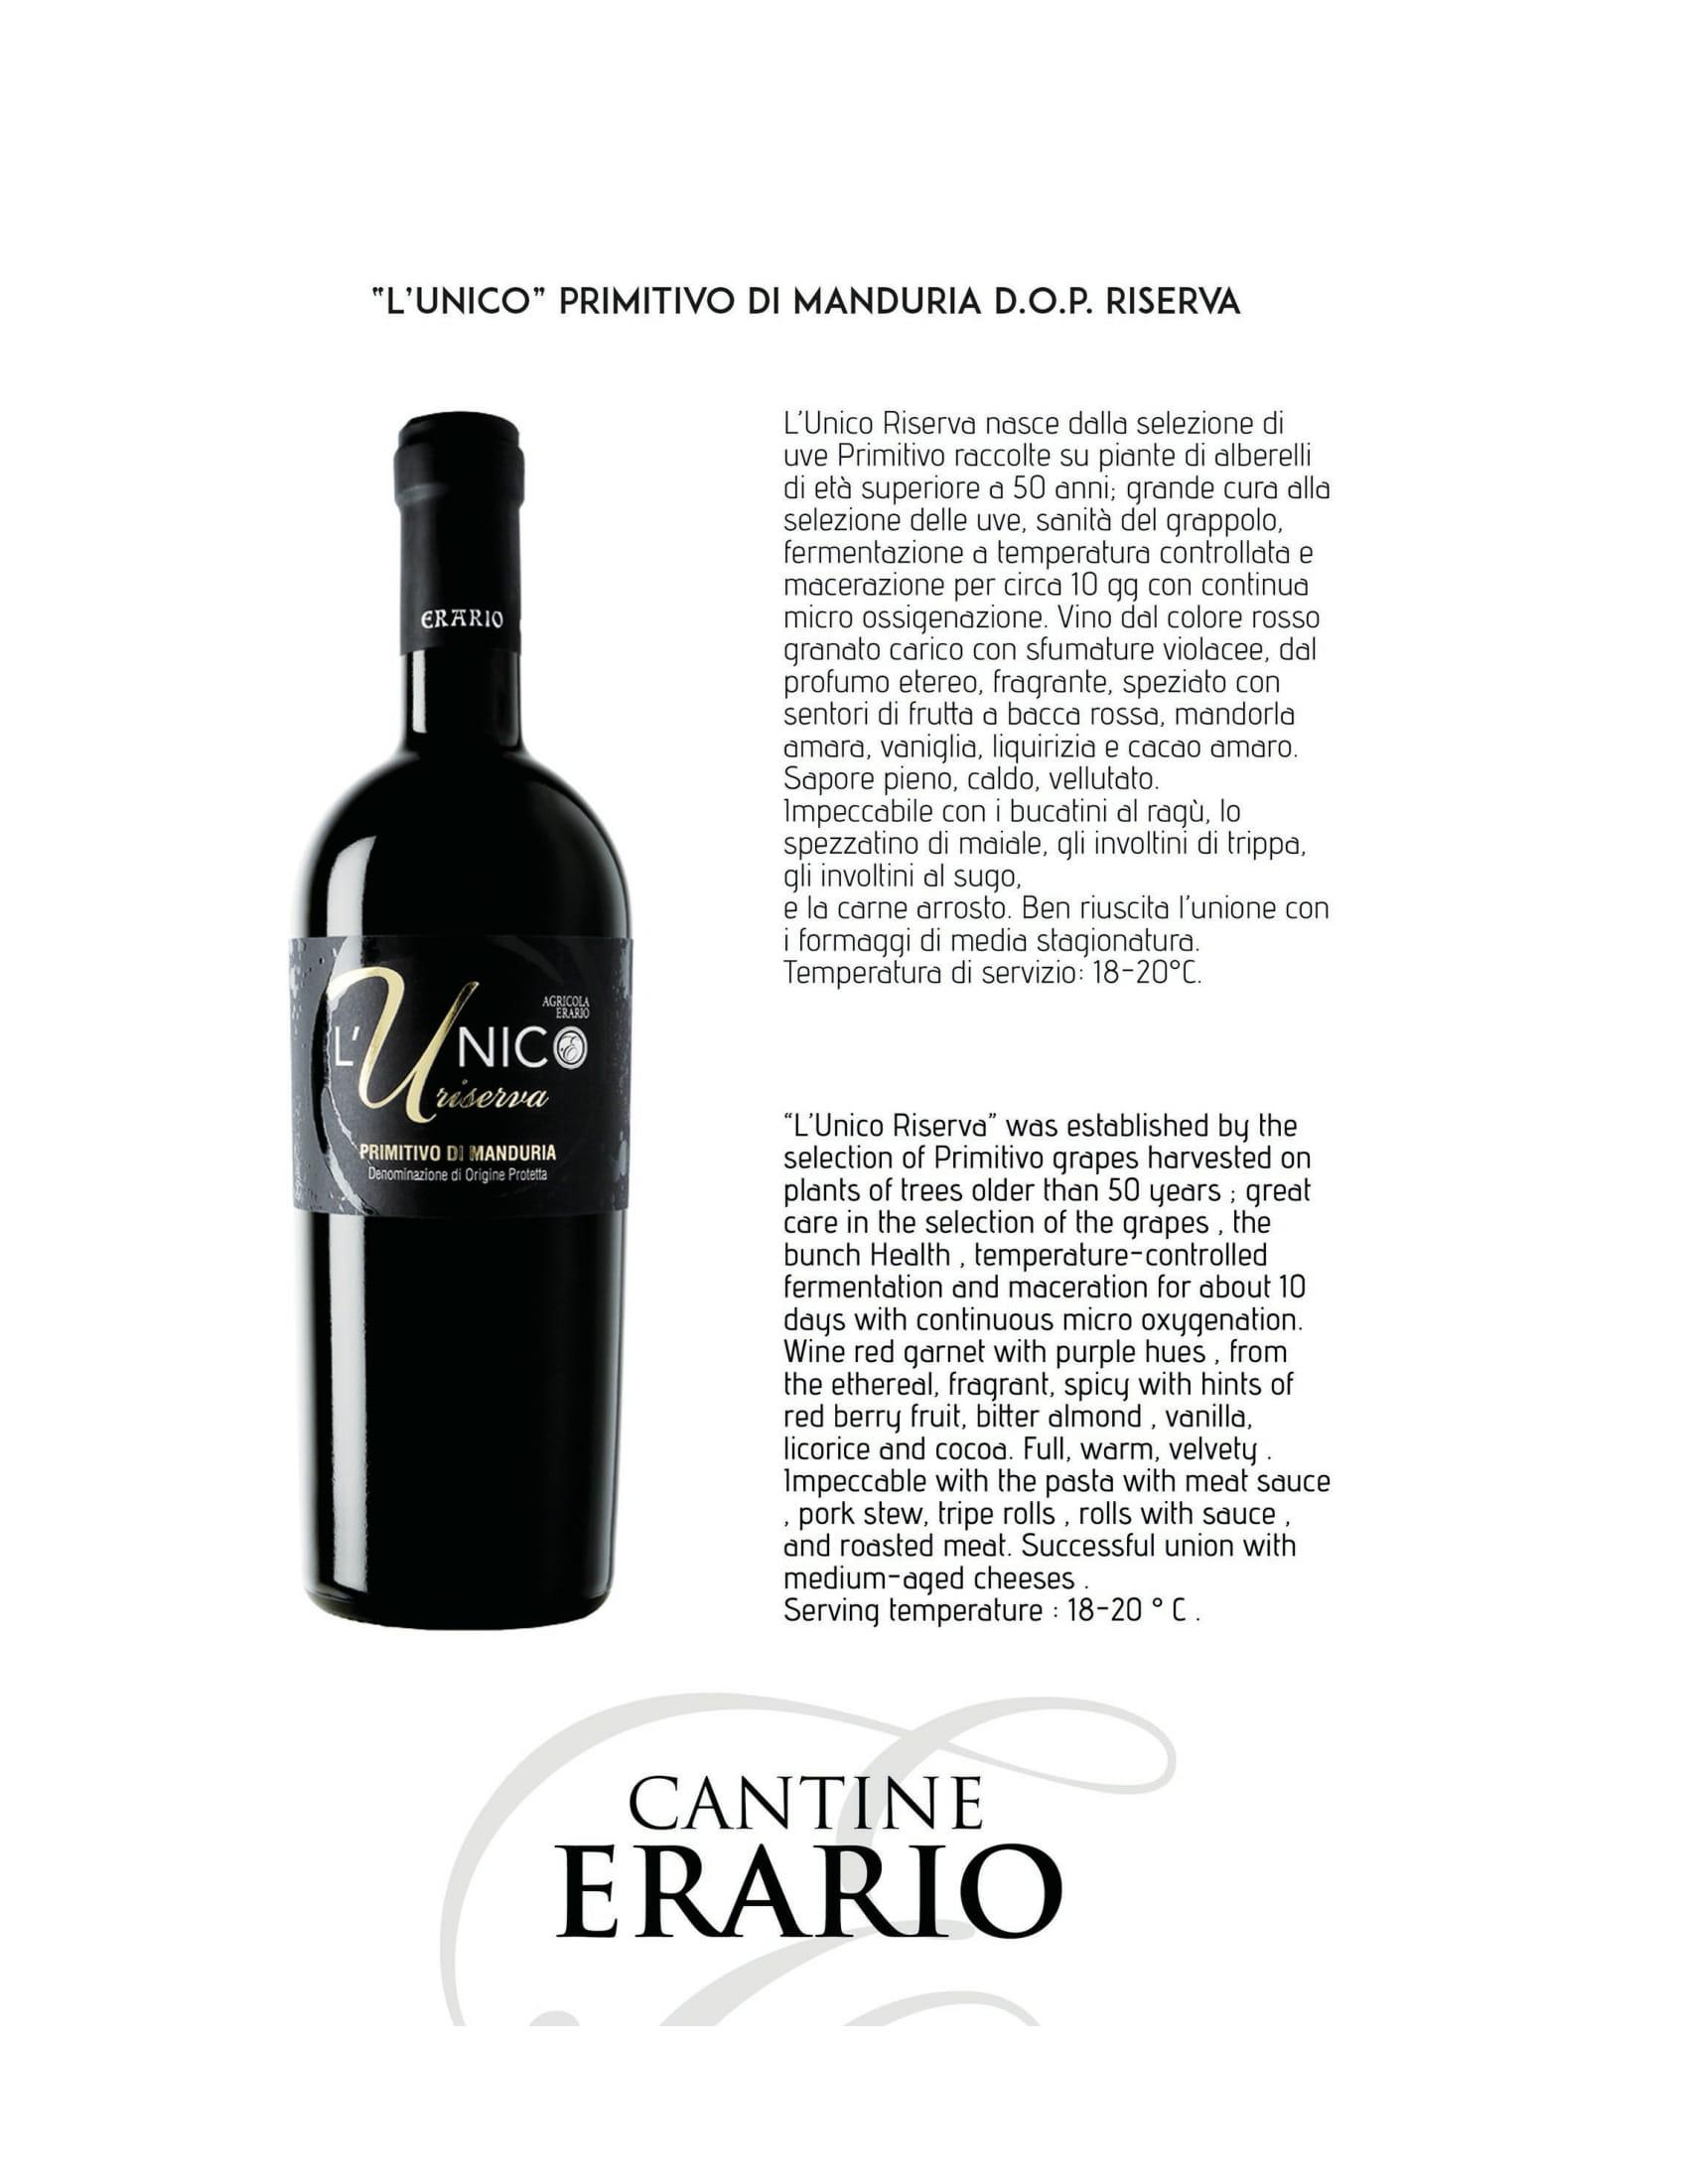 erario vino unico primitivo manduria dop-1jpg